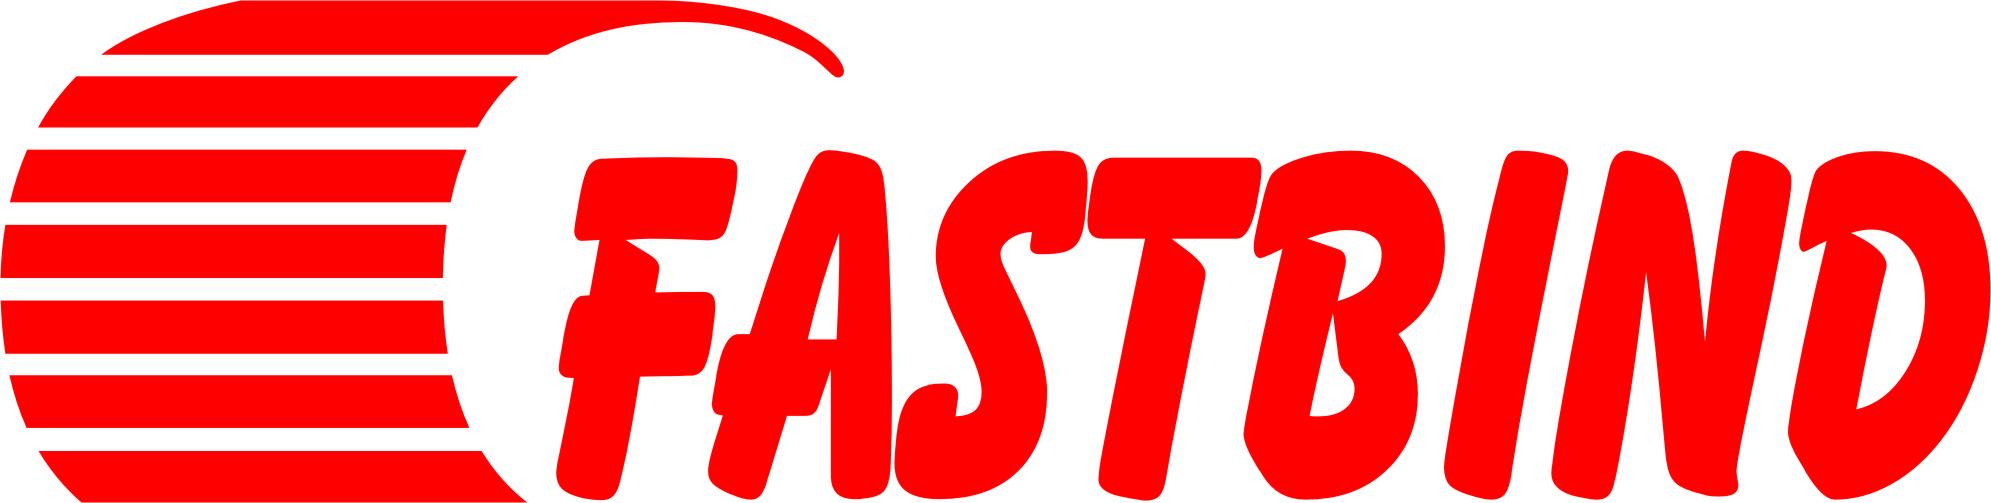 logo_Fastbind_CMYK